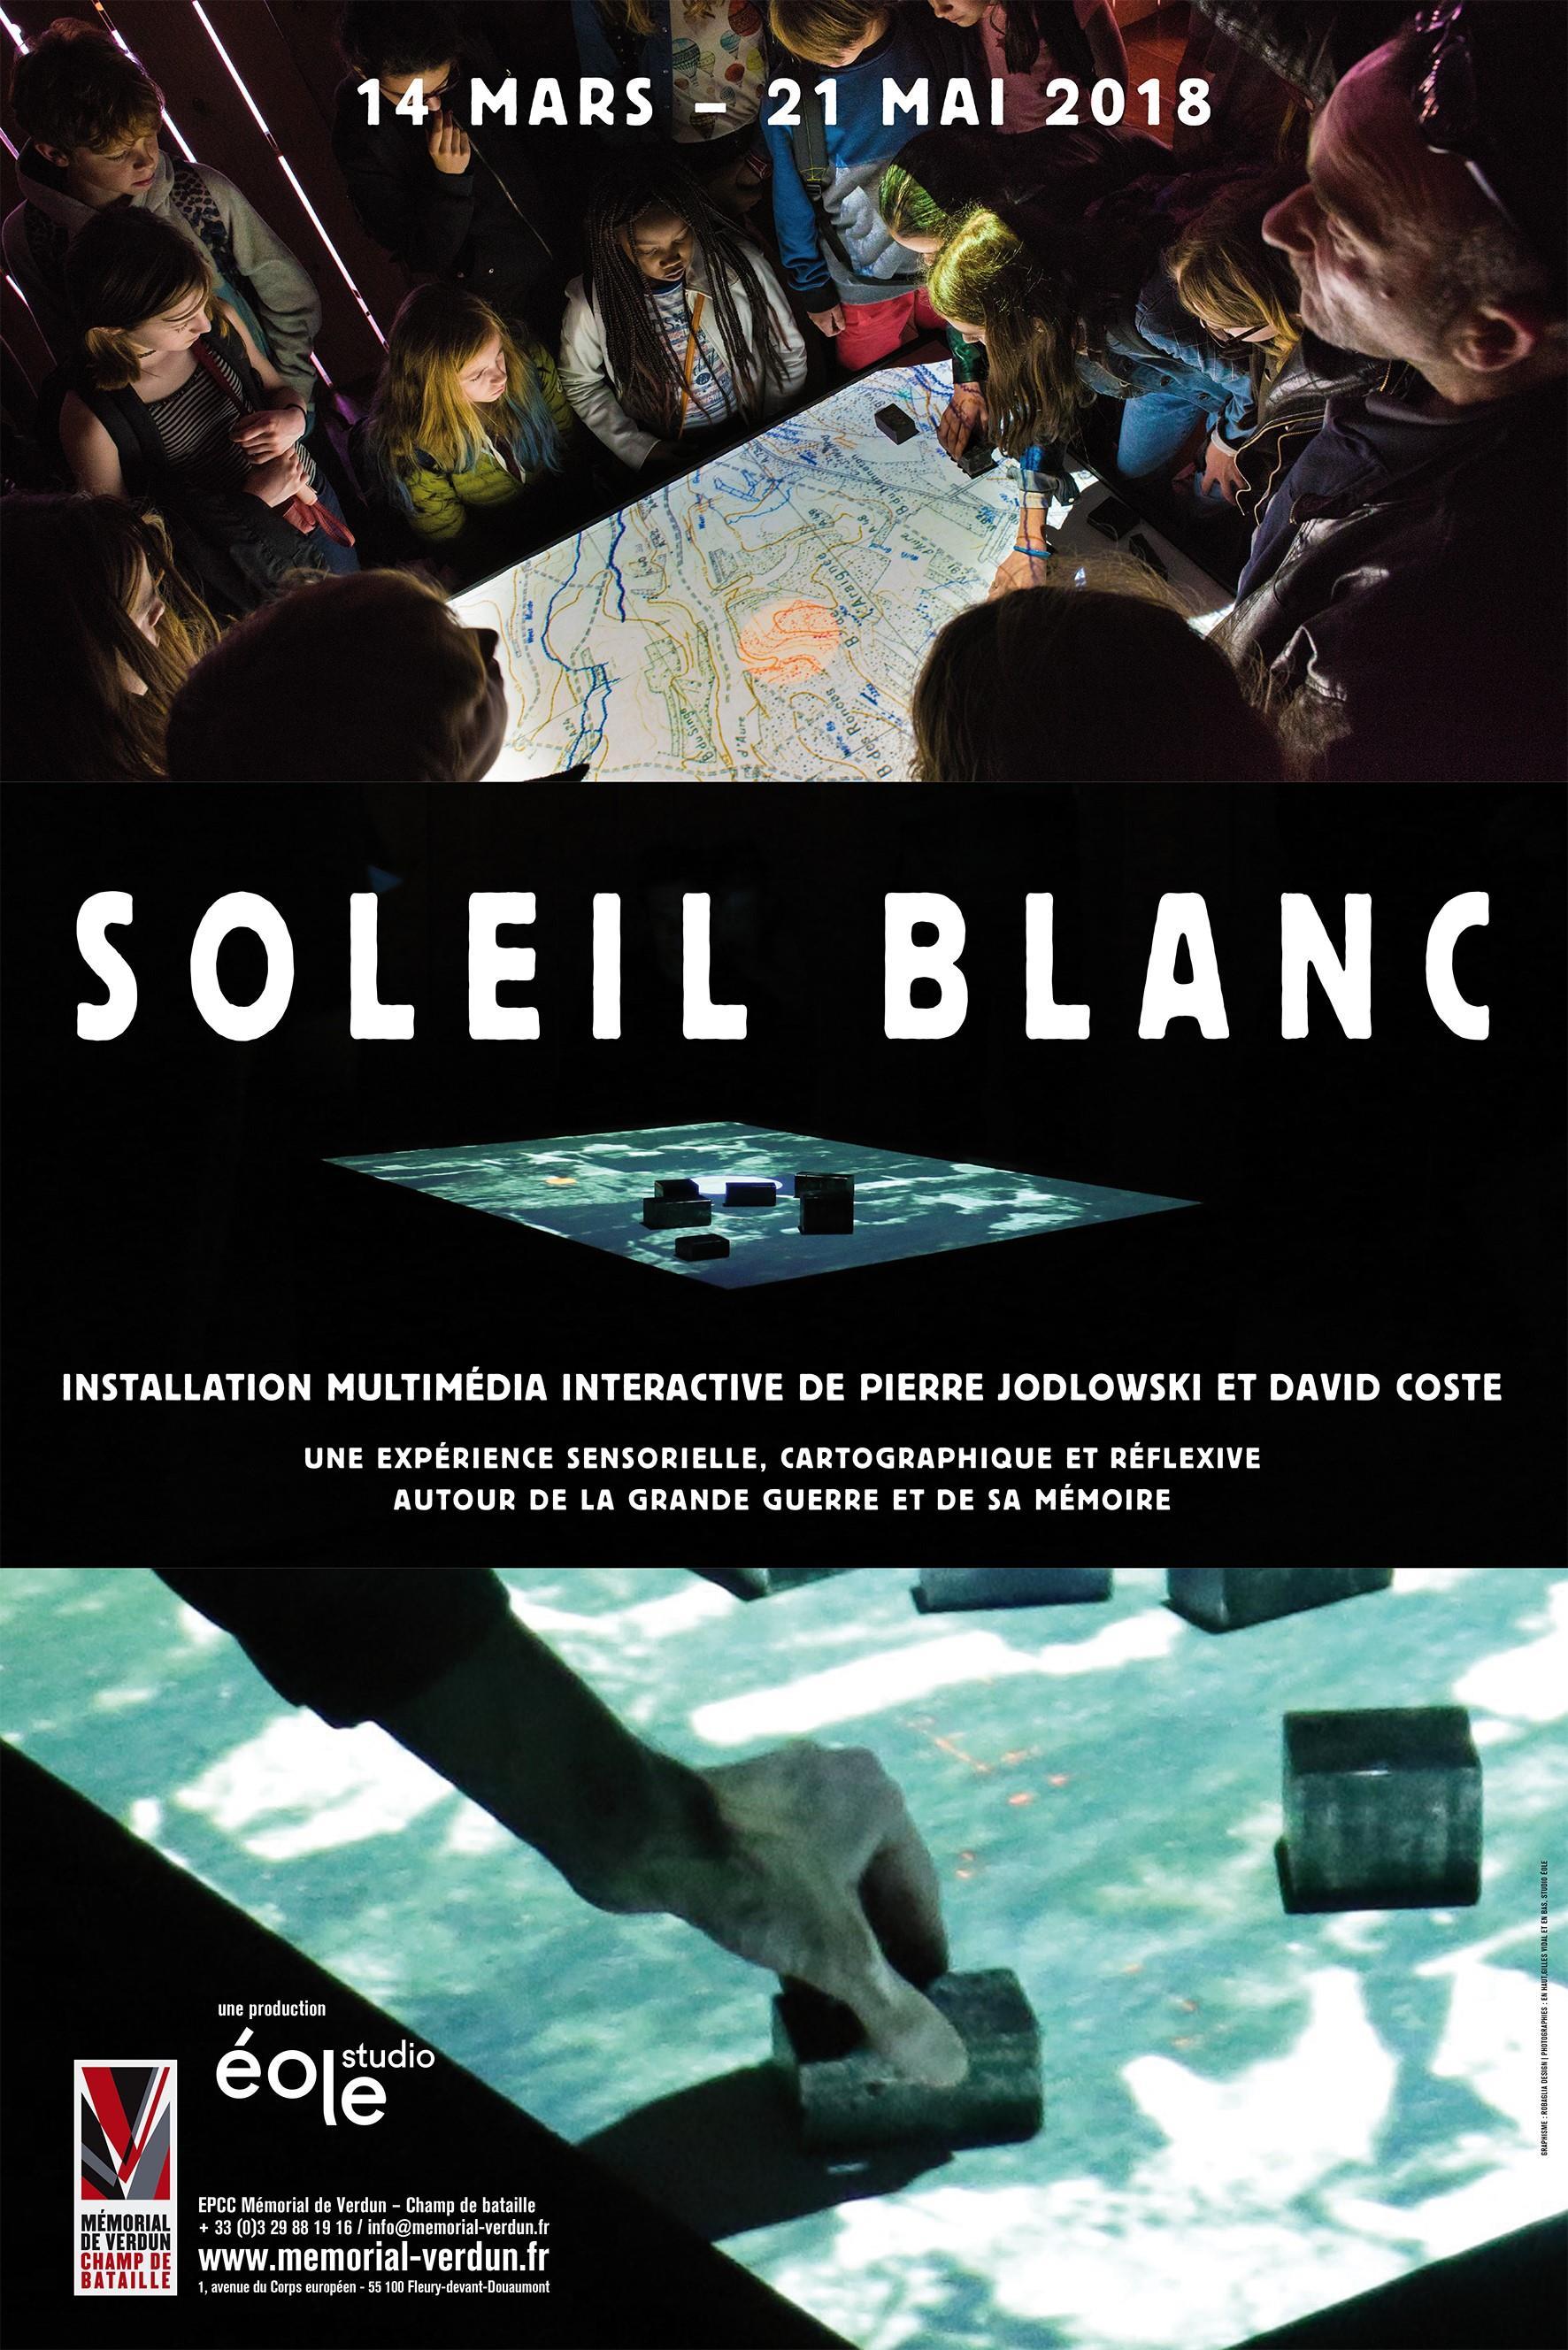 EXPOSITION | SOLEIL BLANC, INSTALLATION AUDIOVISUELLE INTERACTIVE DE PIERRE JODLOWSKI ET DAVID COSTE